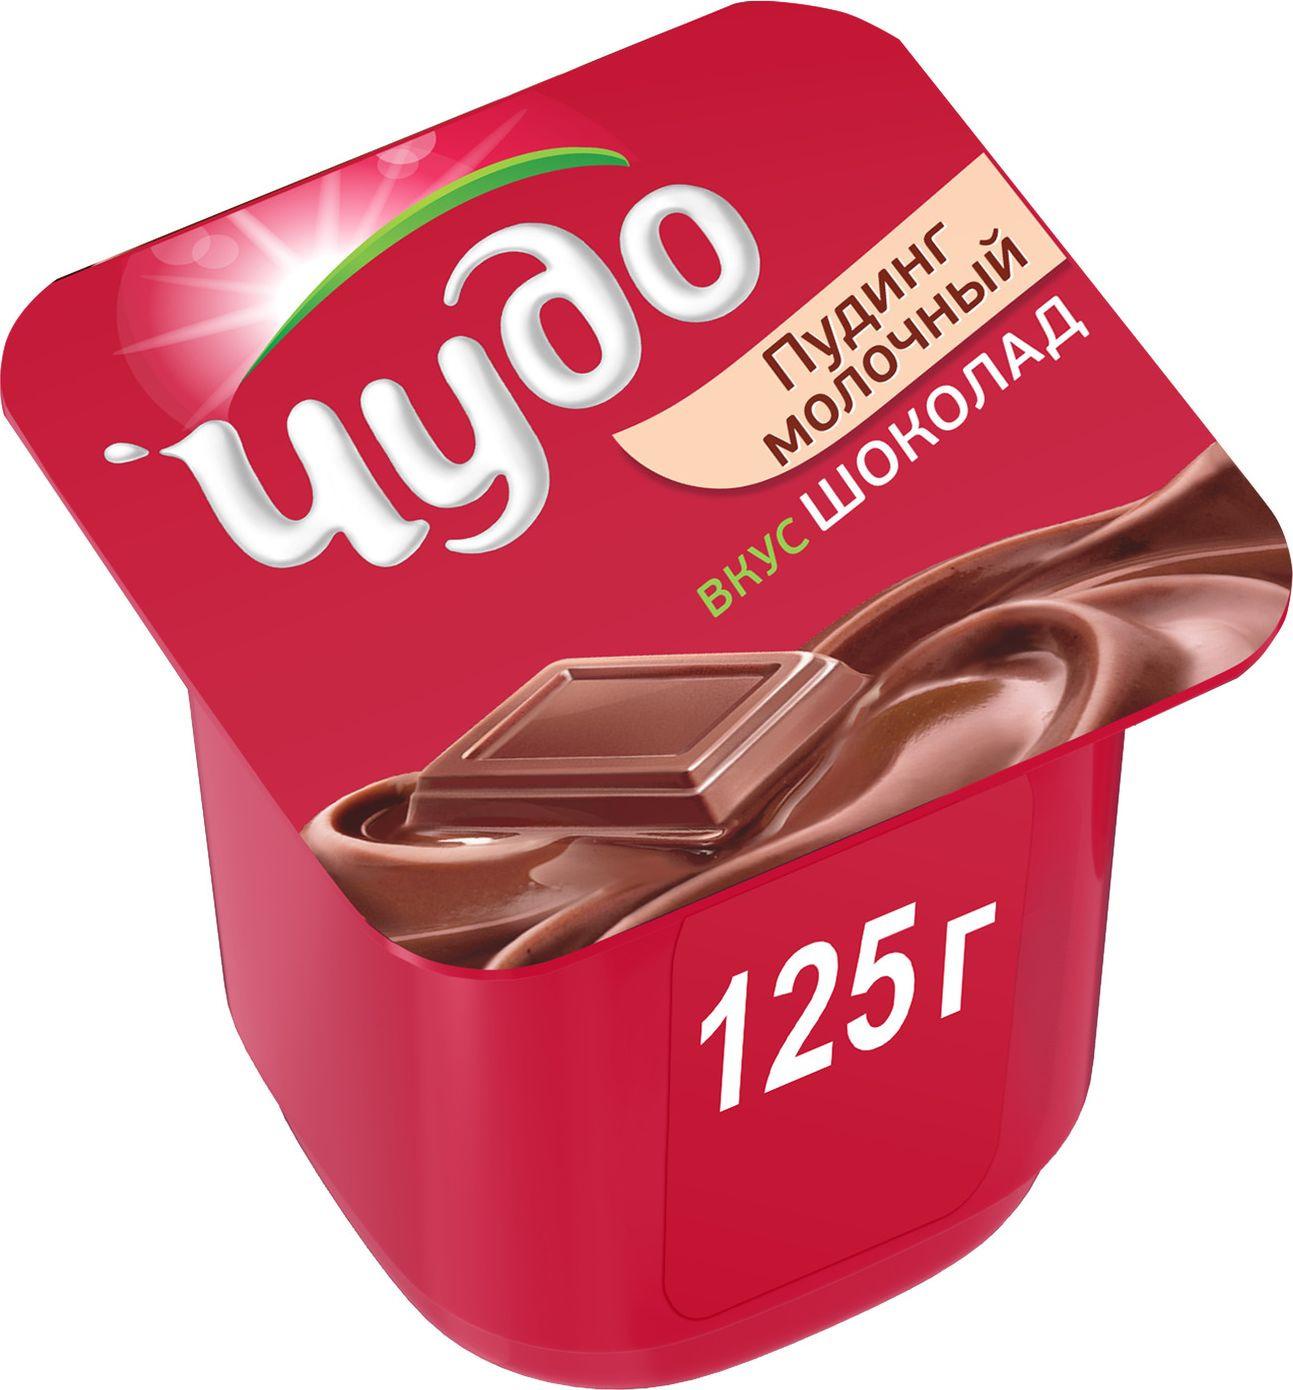 Пудинг со вкусом шоколада 3% Чудо, 125 г haas пудинг банановый 40 г